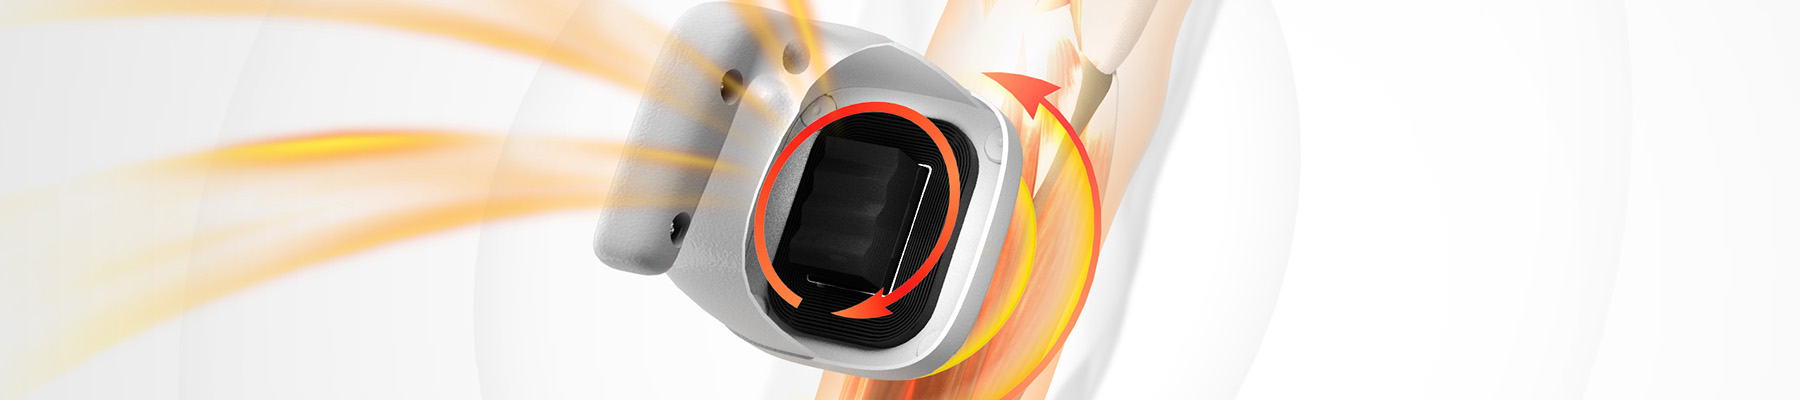 PSTHLEADER magnetic stimulation system